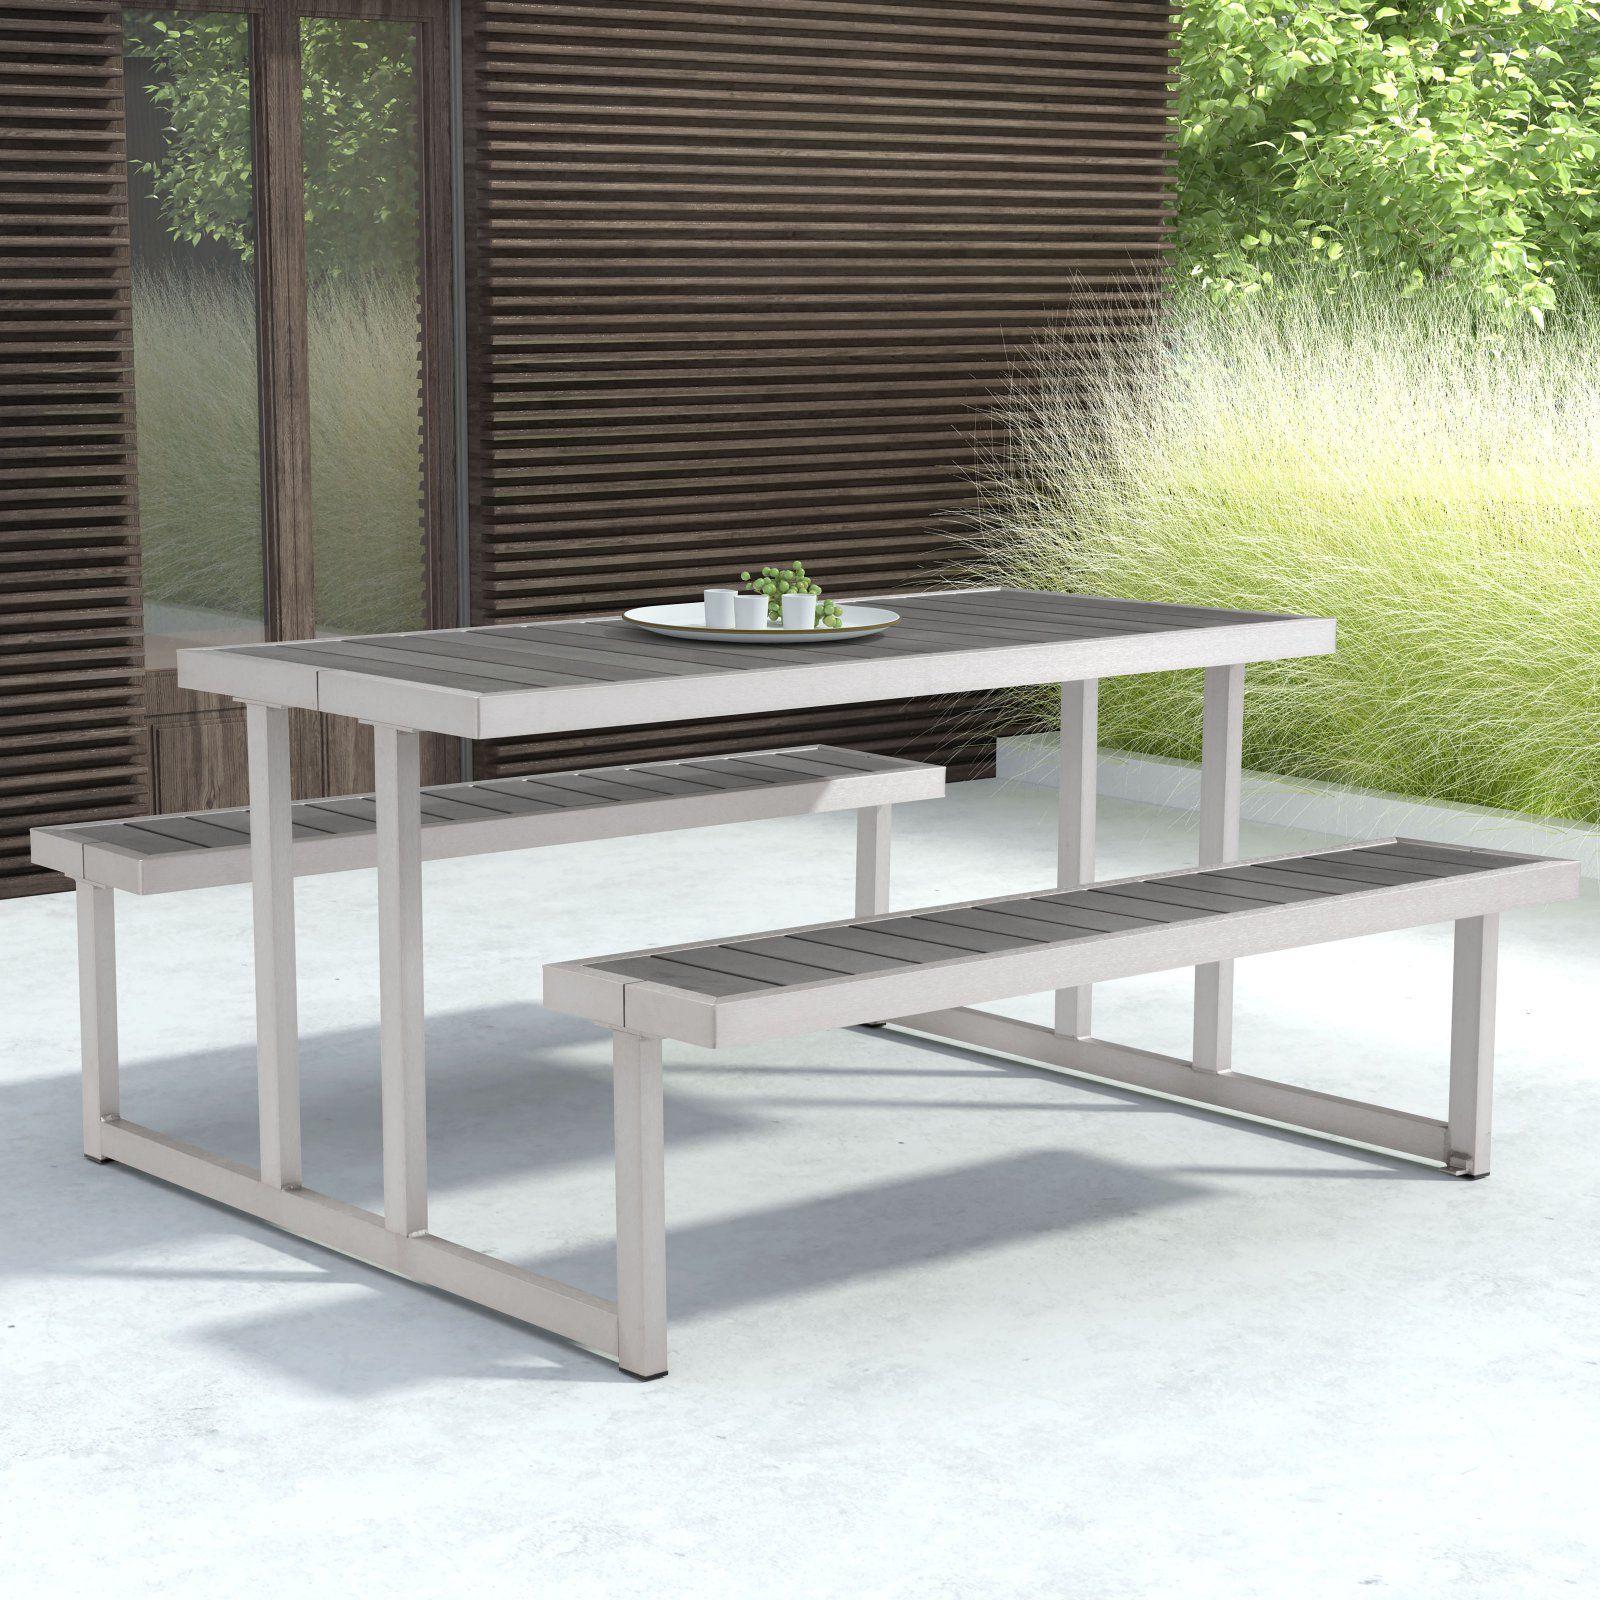 Outdoor zuo vive cuomo picnic table